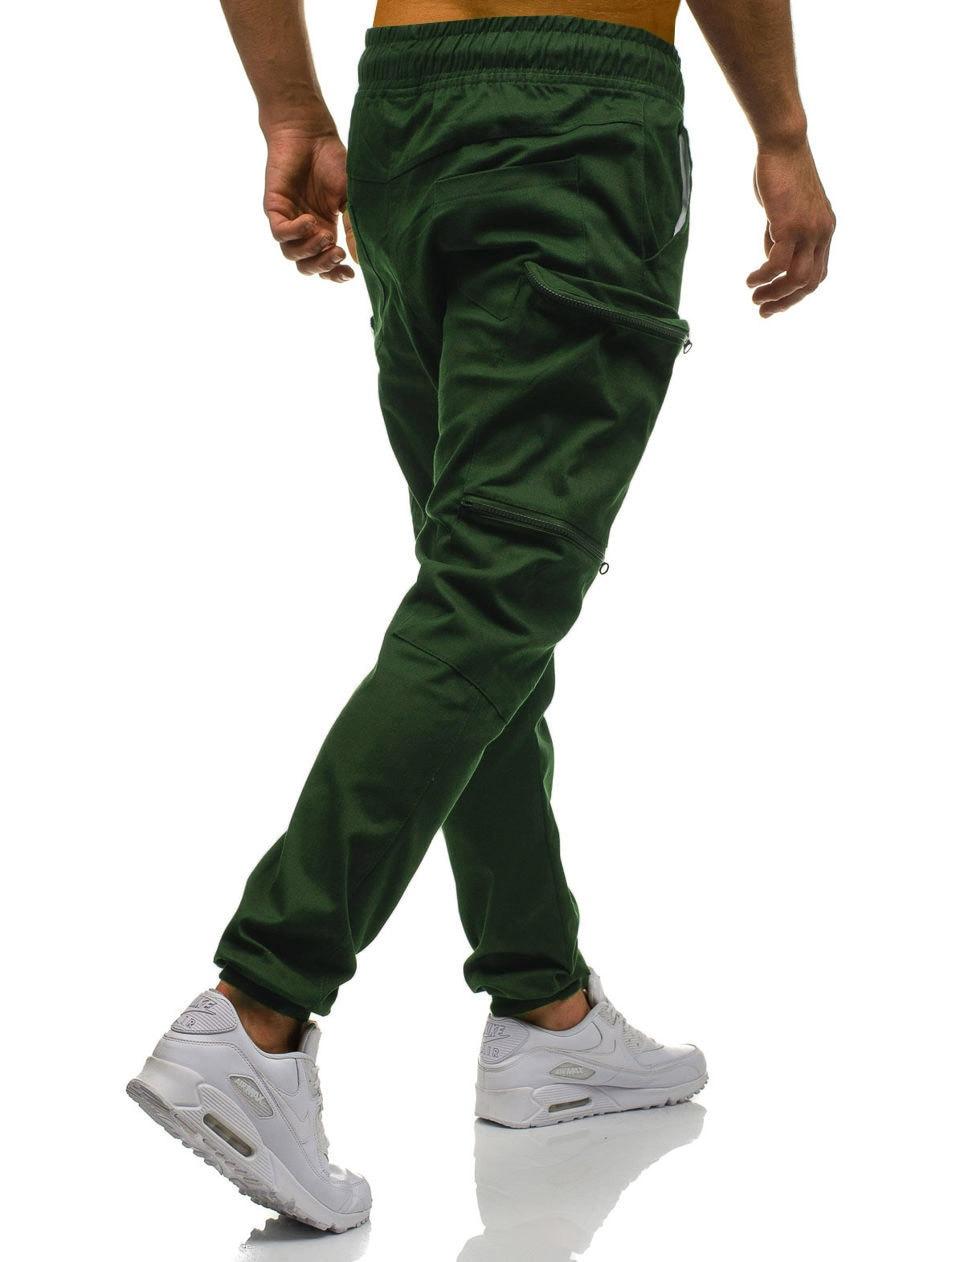 HTB1vvYlL3HqK1RjSZJnq6zNLpXaS Mens Joggers 2019 New Red Camouflage Multi-Pockets Cargo Pants Men Cotton Harem Pants Hip Hop Trousers Streetwear XXXL